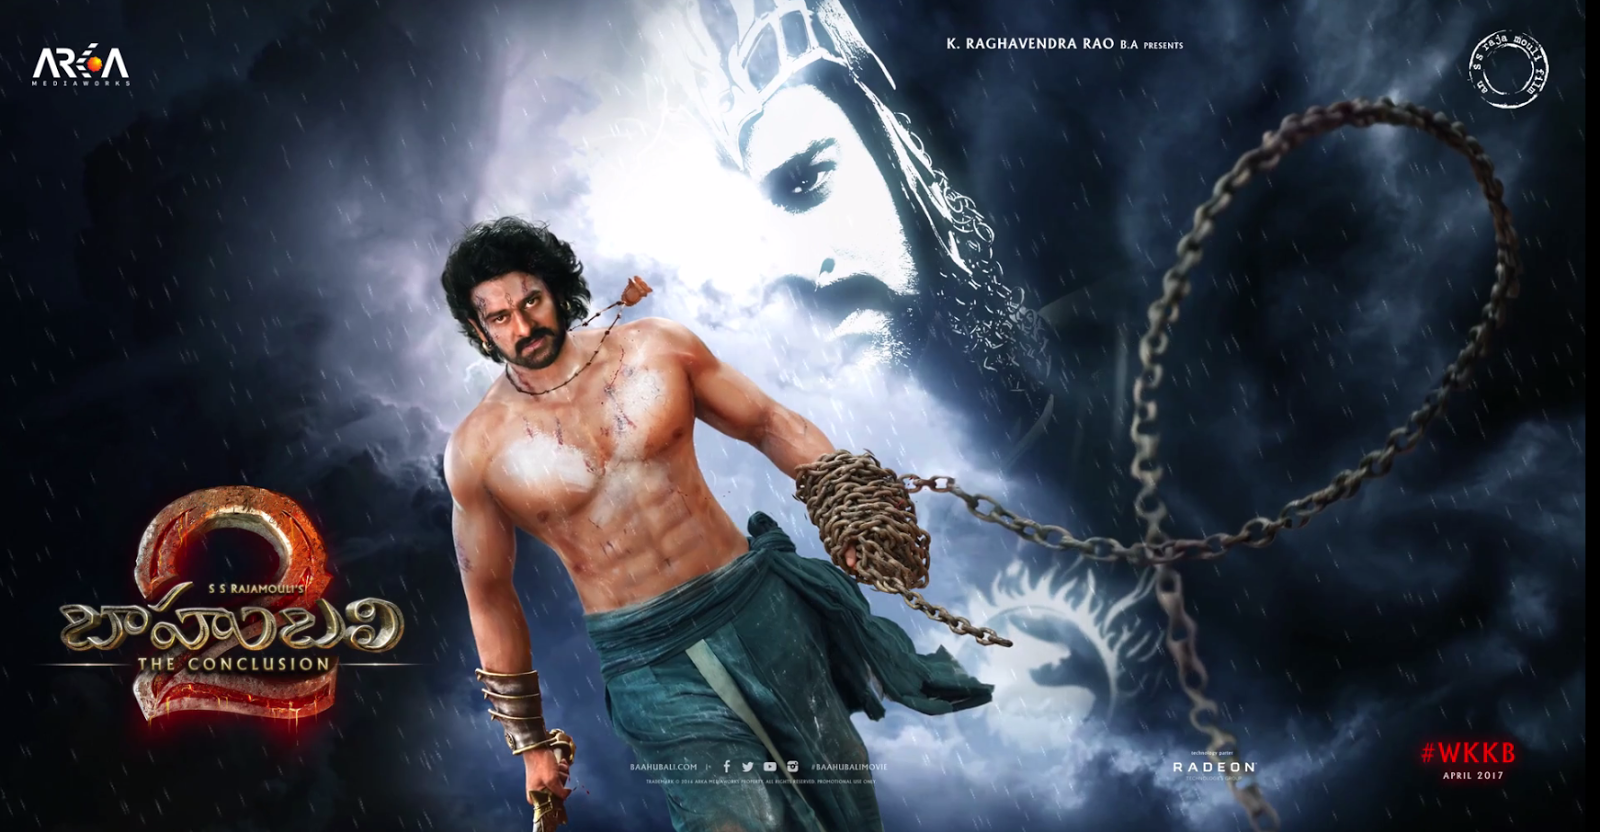 Baahubali 2 telugu movie online watch | Бахубали (2015